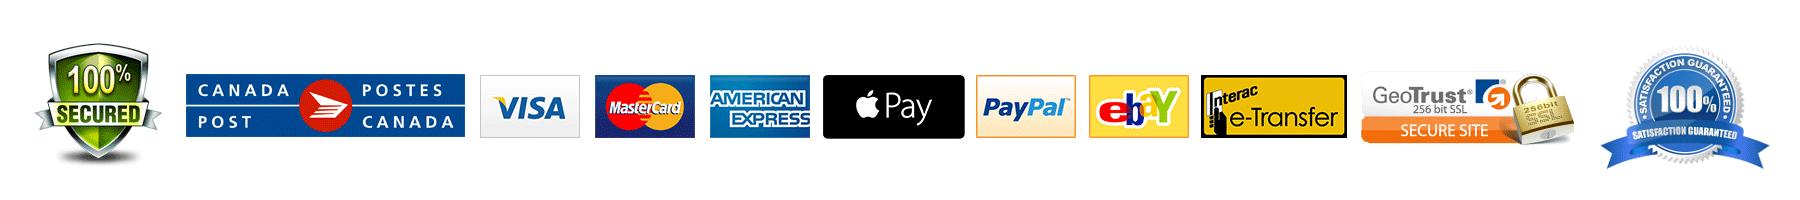 payment-banner-v7-web.png